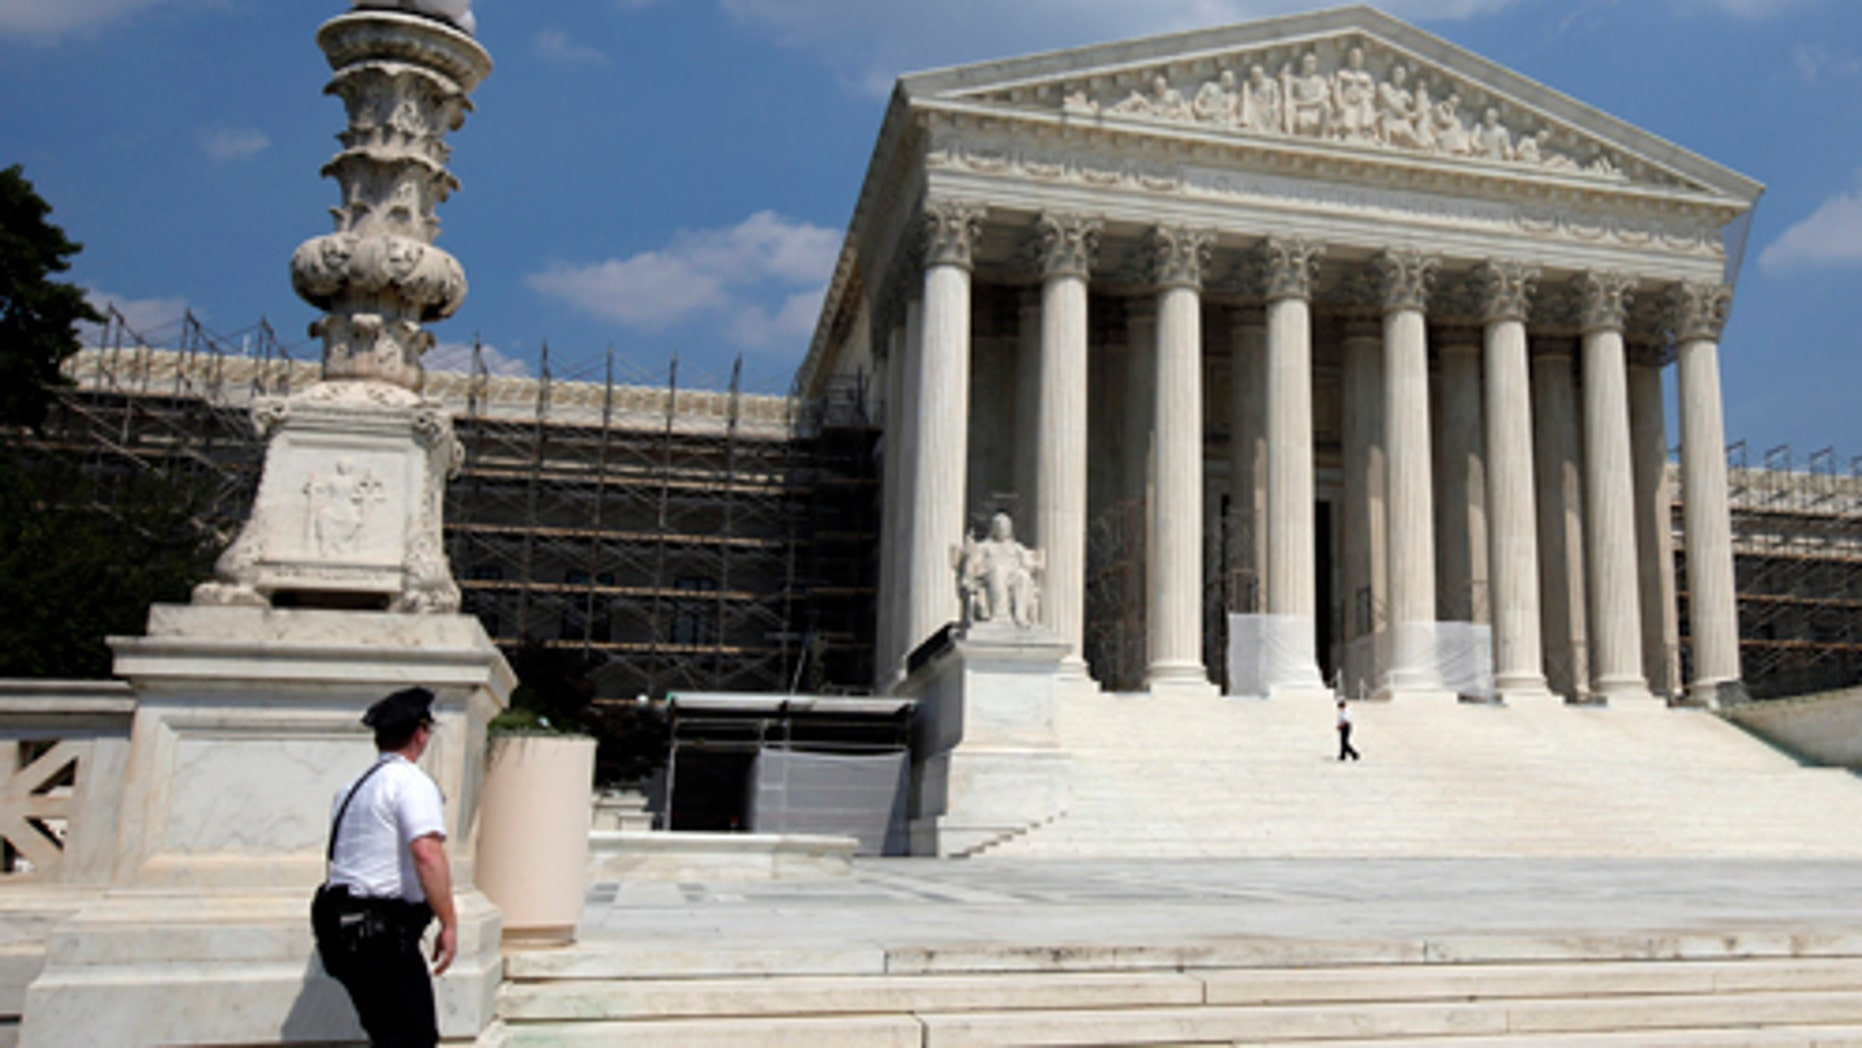 FILE: 2013: The Supreme Court building, in Washington, D.C.